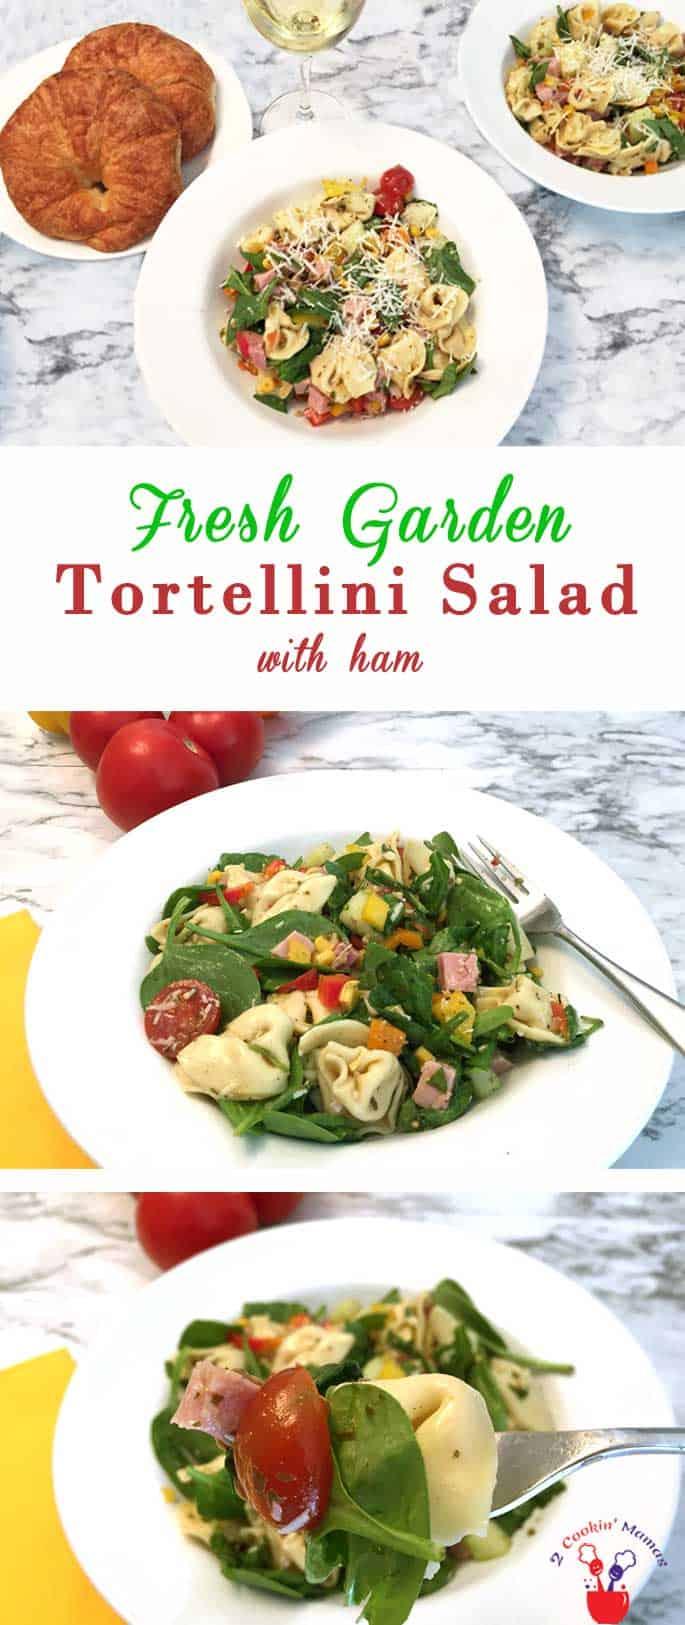 Garden Tortellini Salad with ham | 2 Cookin Mamas